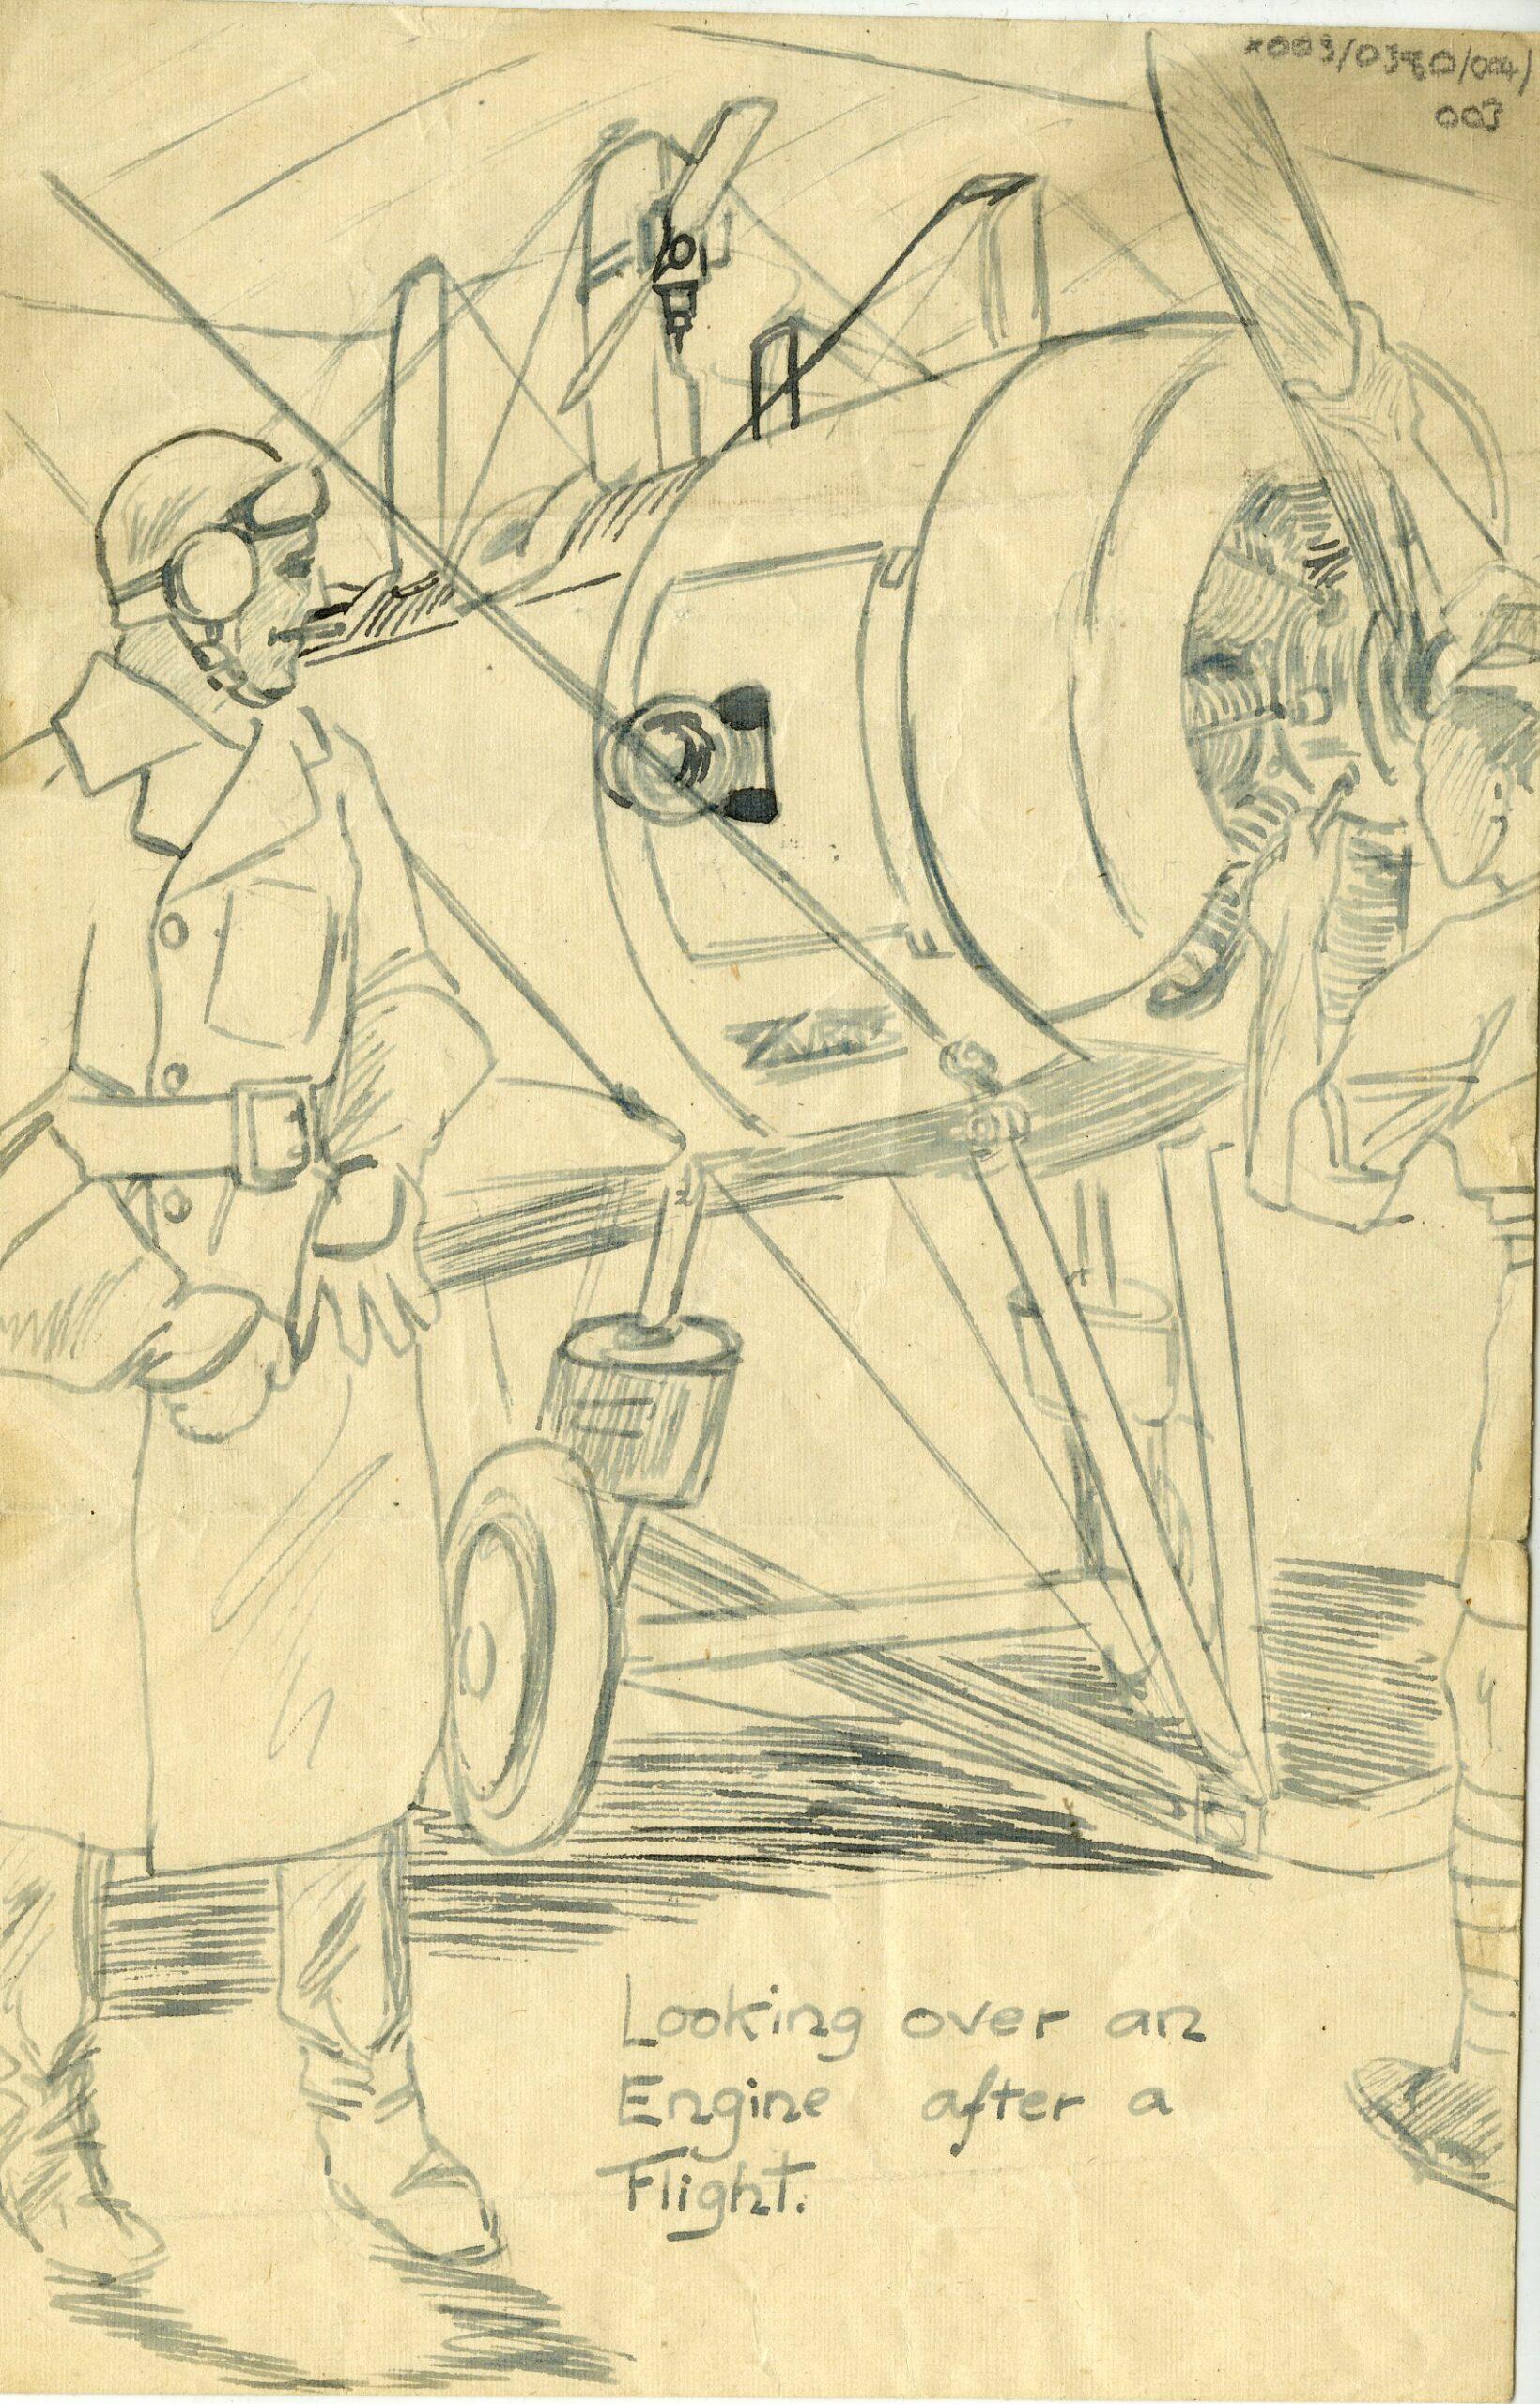 Image: X003-0380/004/003 – Drawing by A Mech 3 John Roscoe. RAF Museum